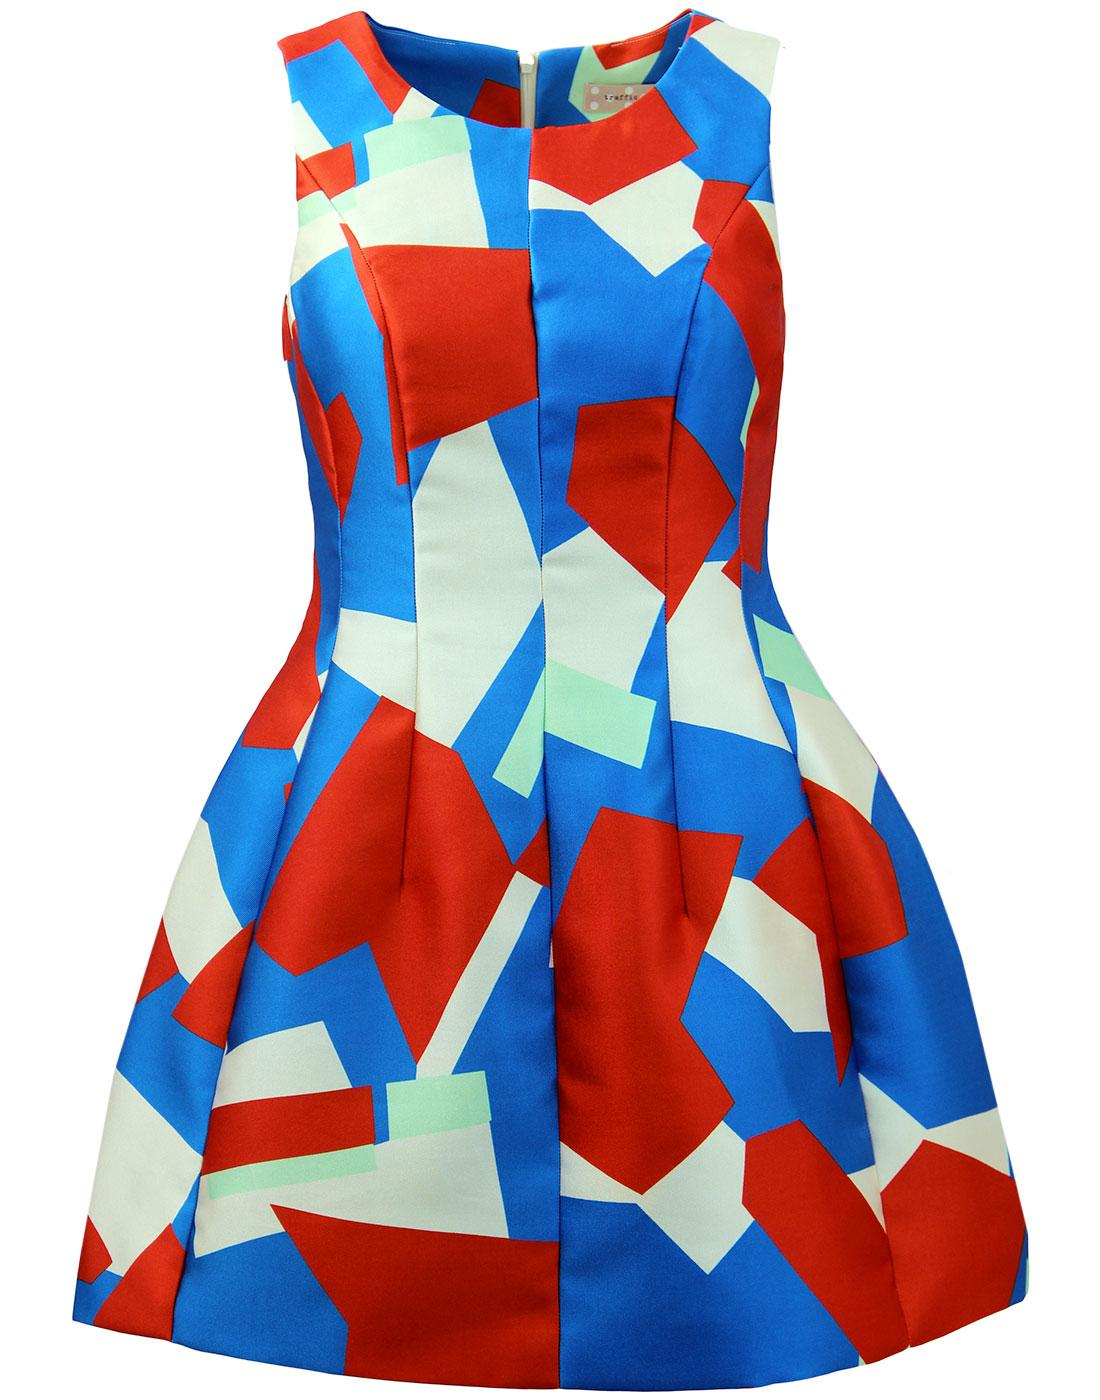 Japer TRAFFIC PEOPLE Geo Print Retro Party Dress